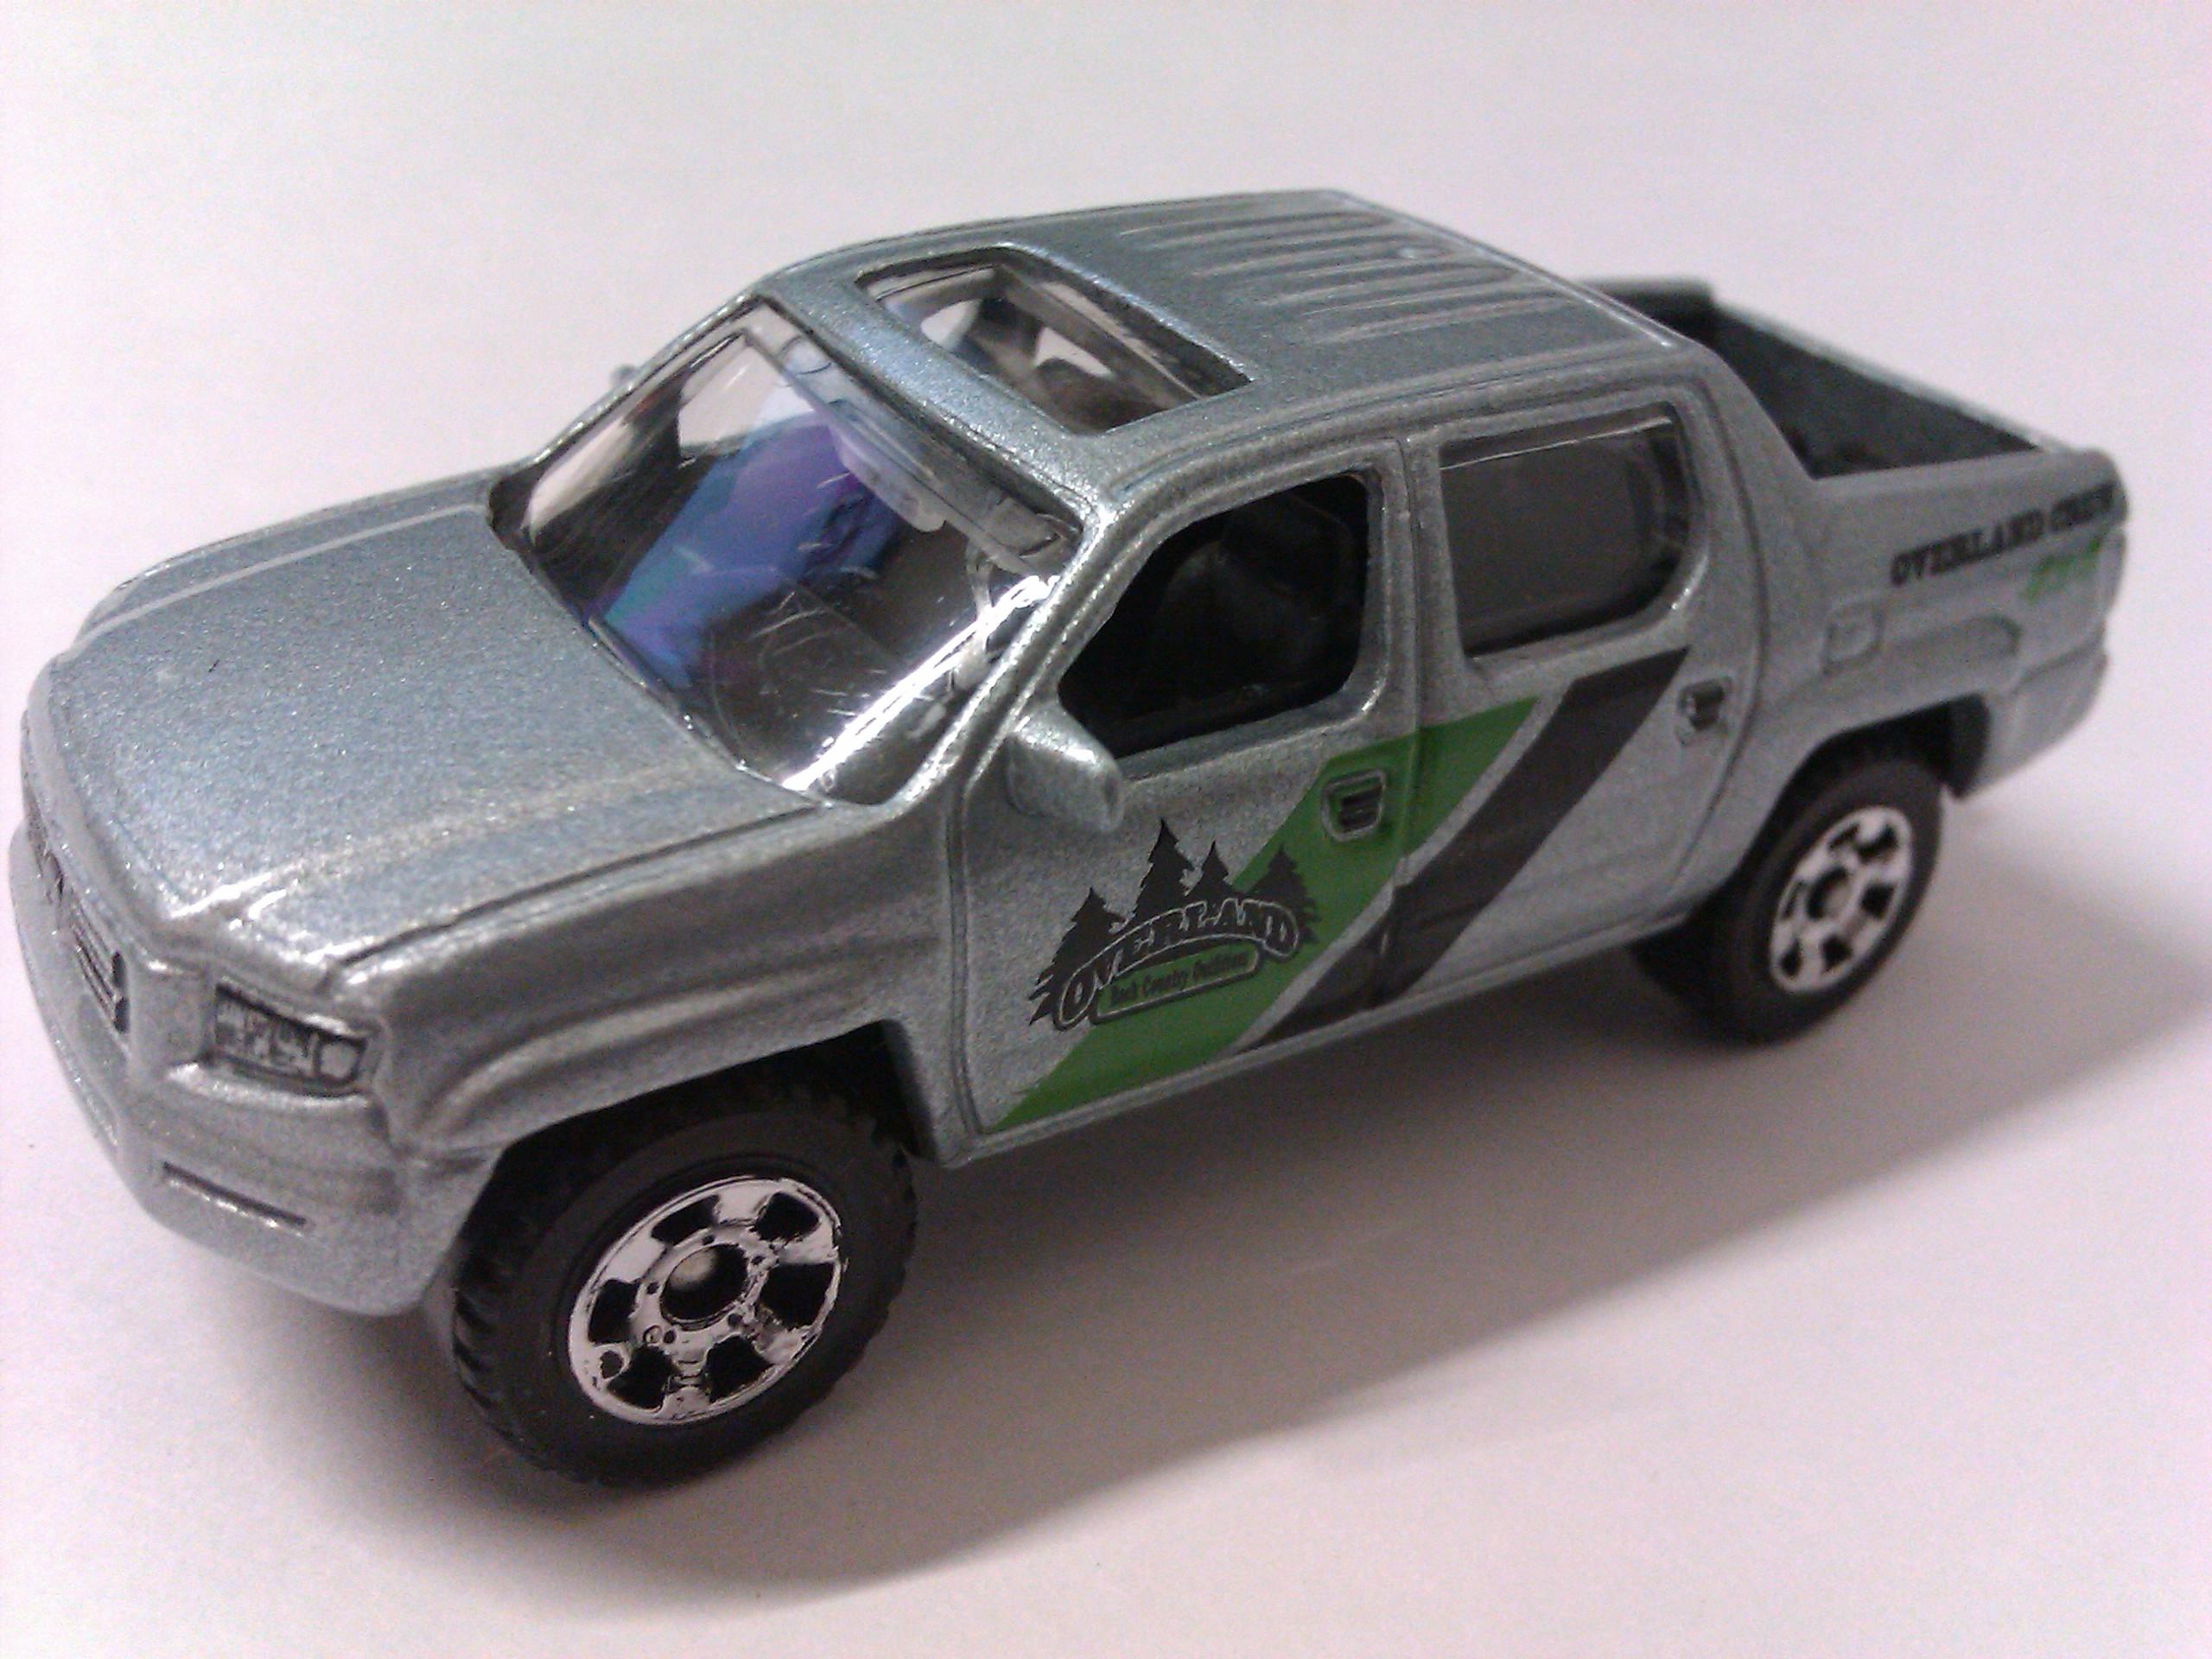 Honda Ridgeline (2007)